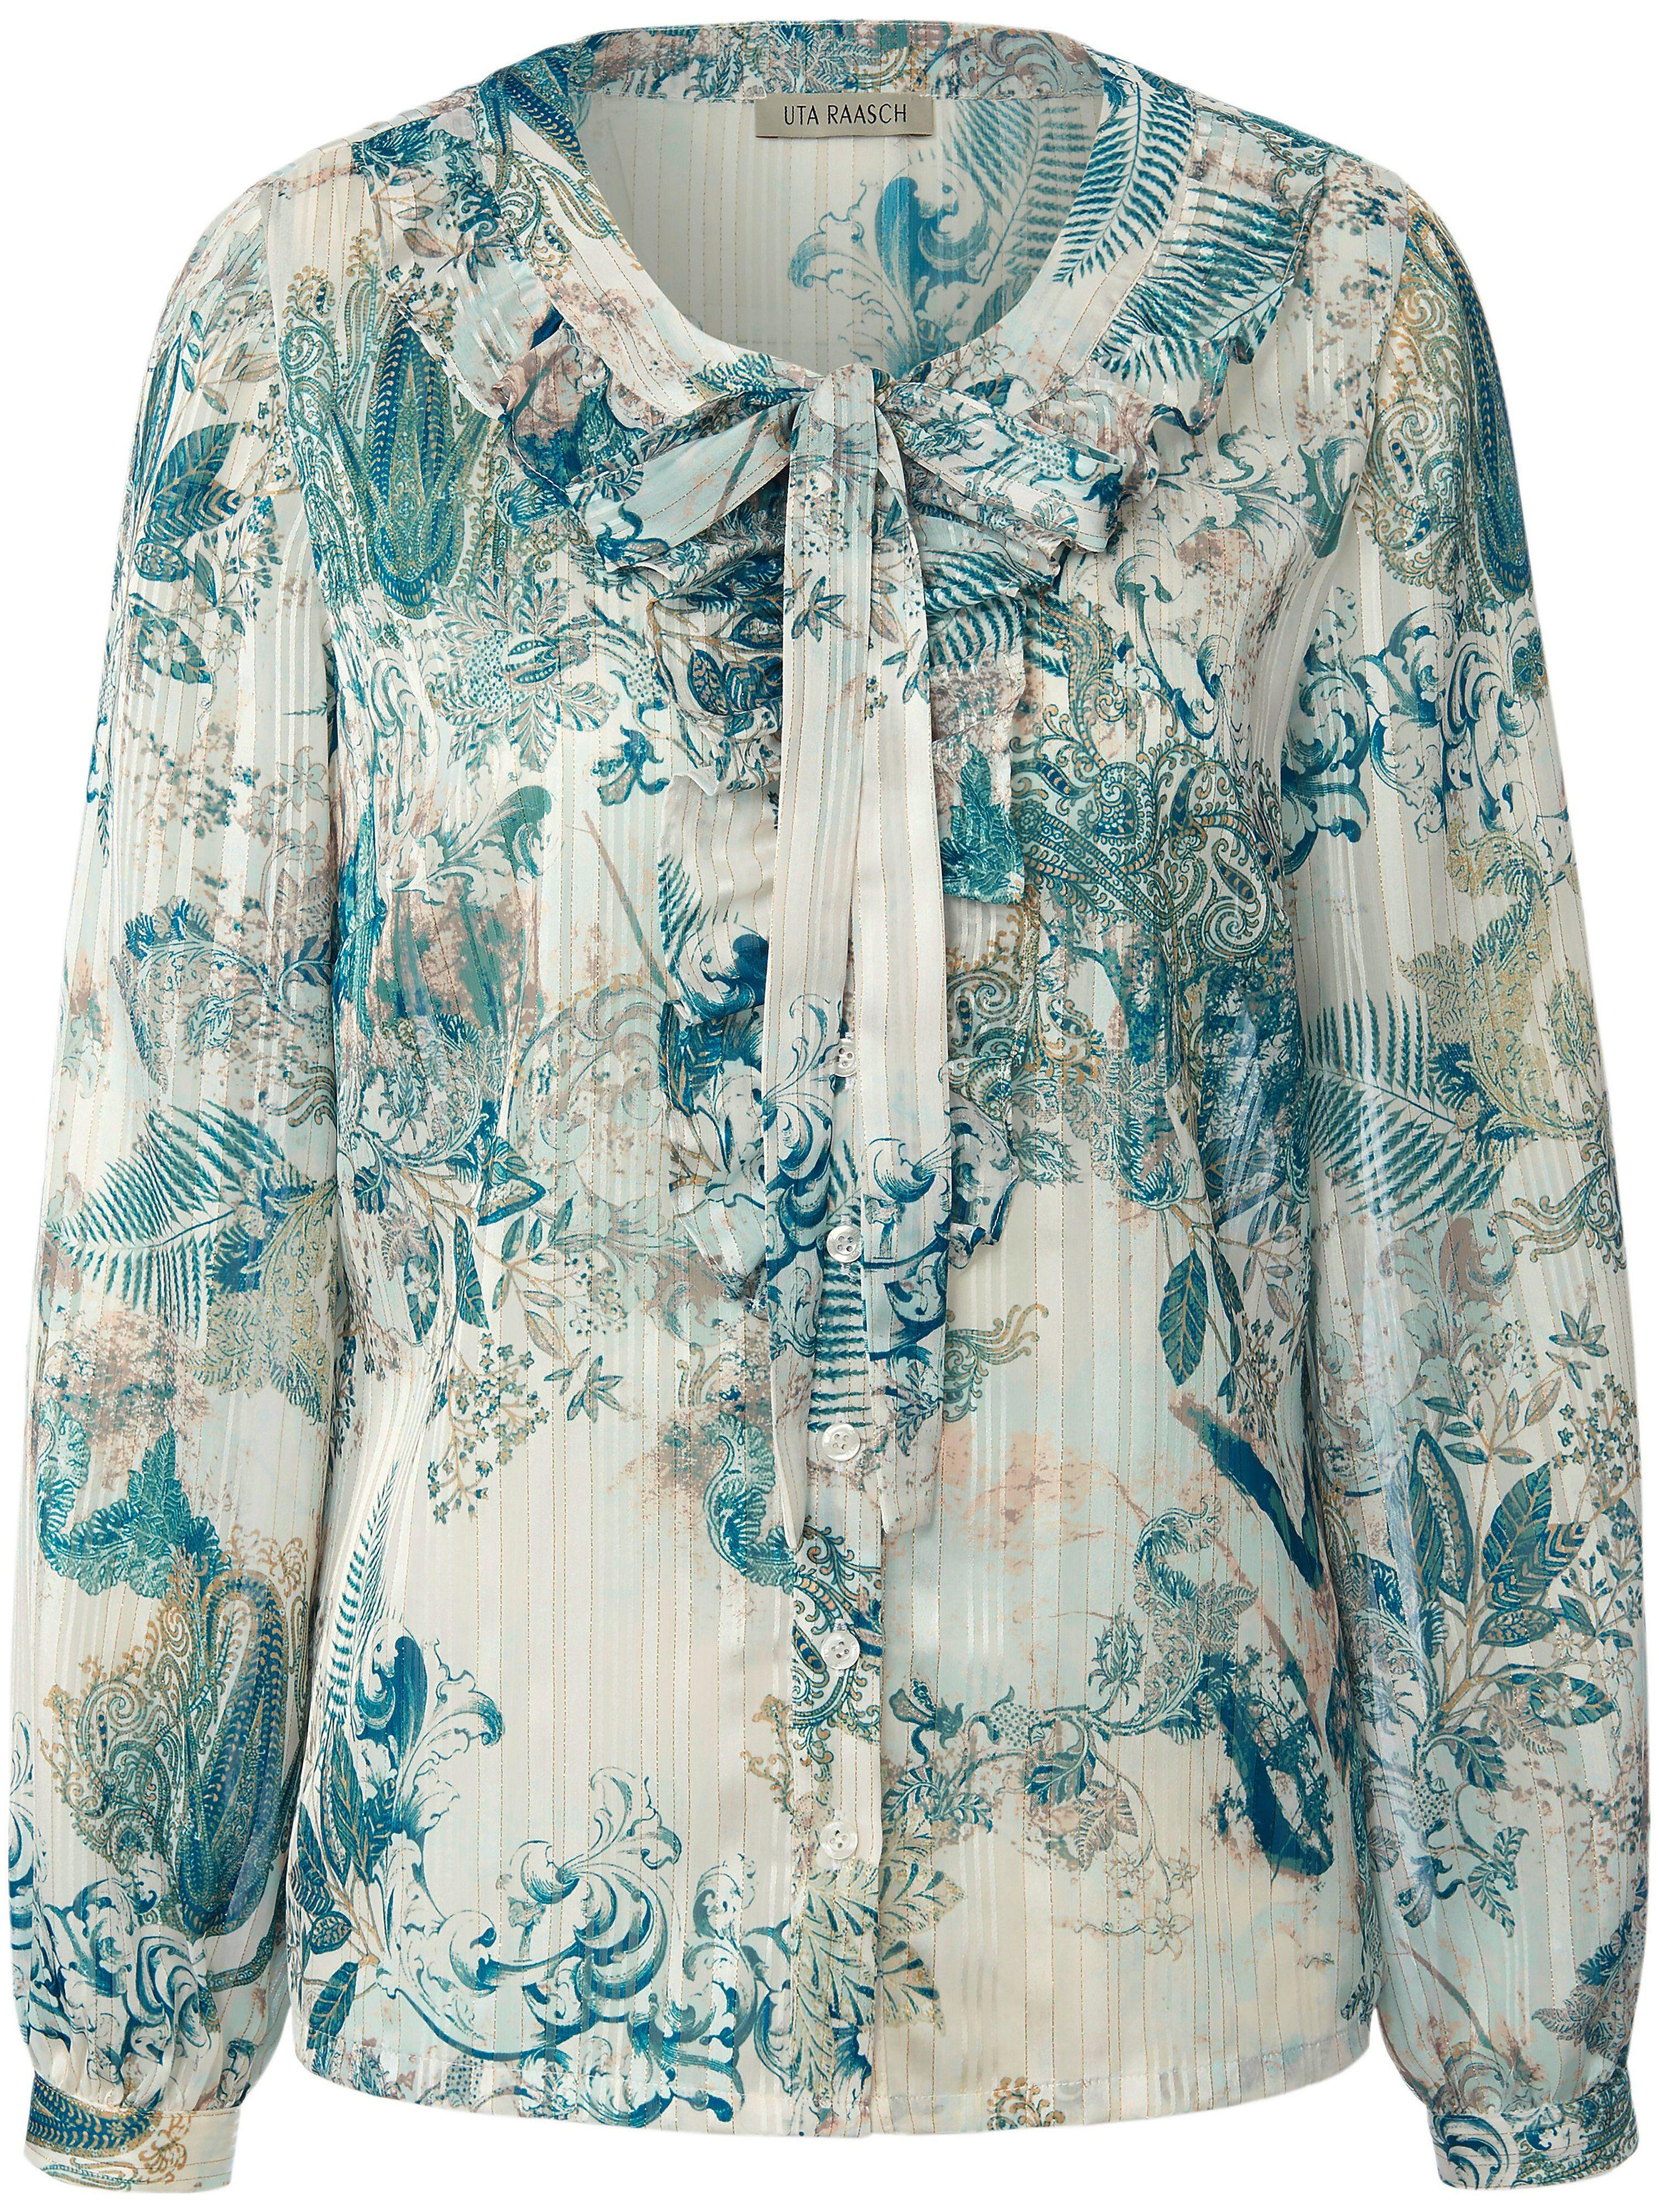 Uta Raasch La blouse manches longues  Uta Raasch multicolore  - Femme - 38